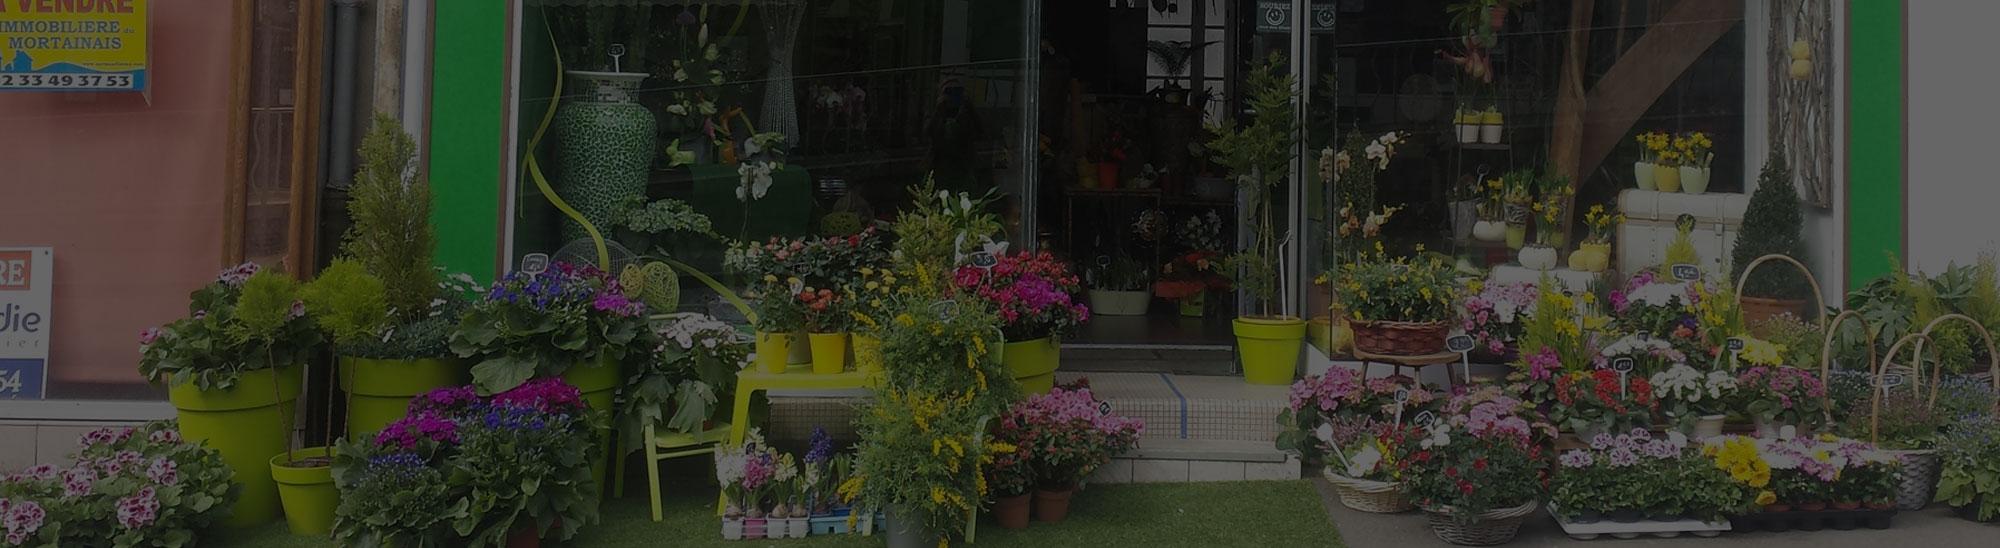 Fleuriste Couterne